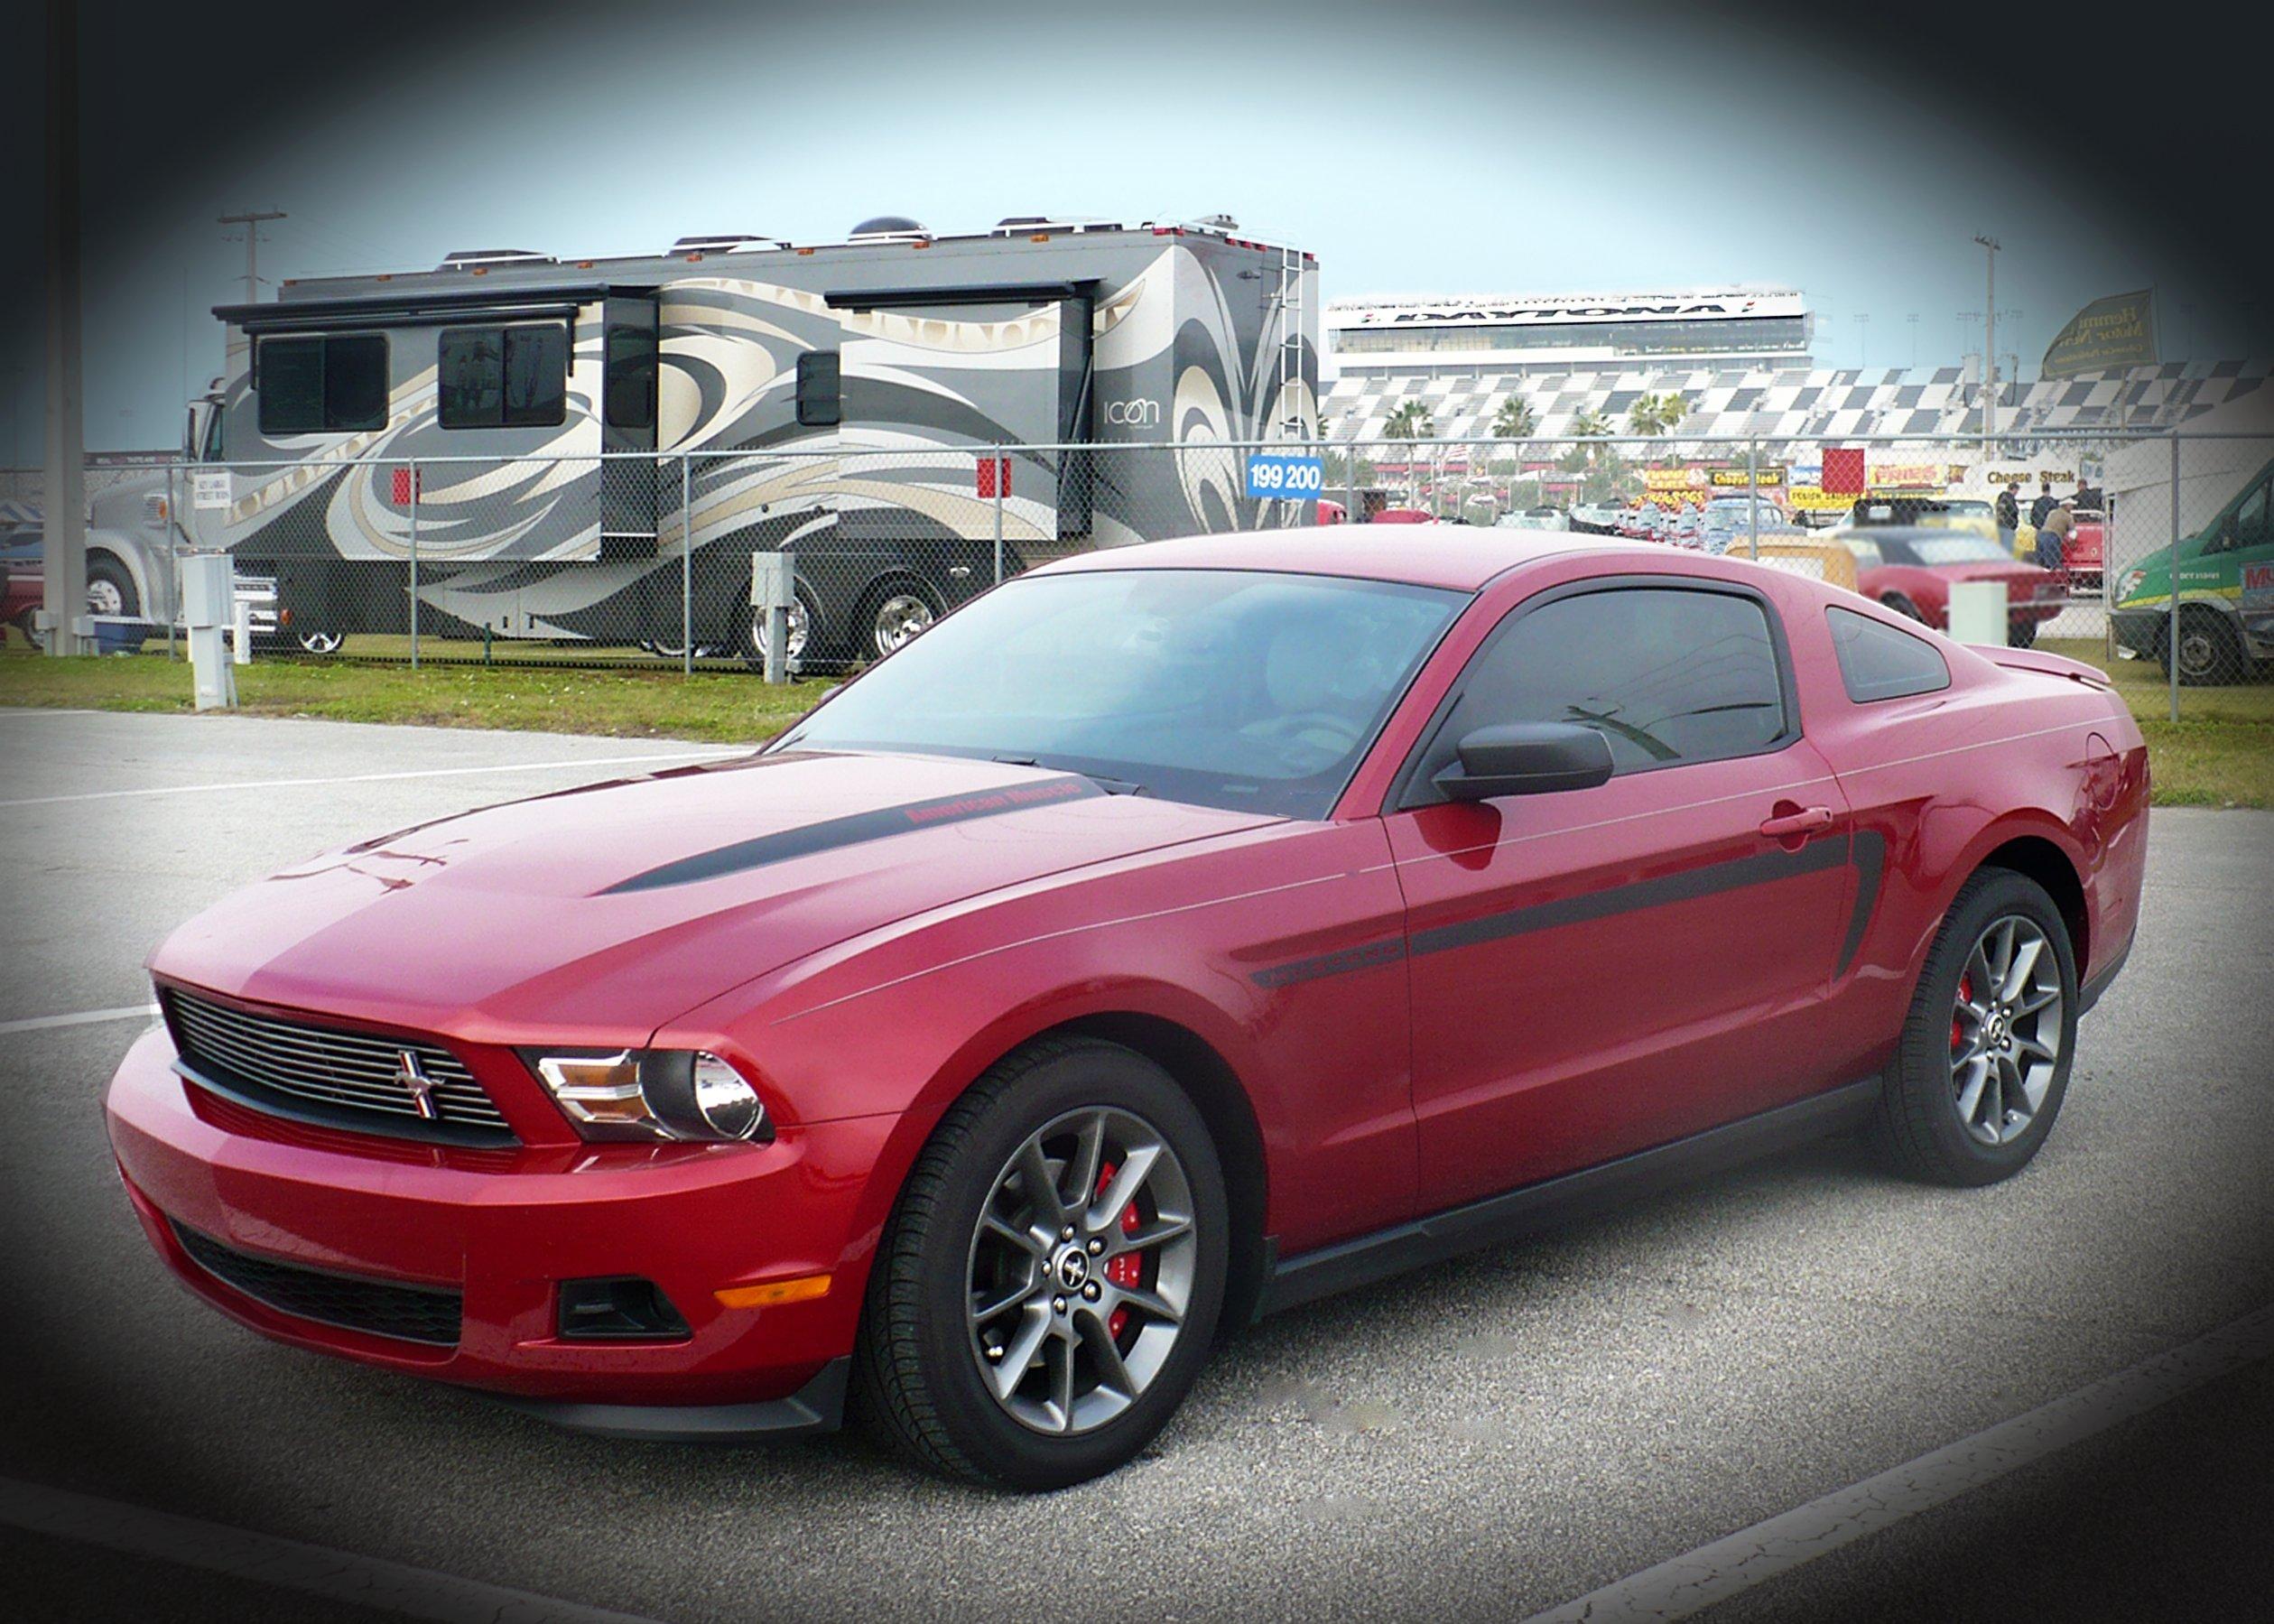 Click image for larger version  Name:Daytona Mustang.jpg Views:107 Size:641.3 KB ID:201815